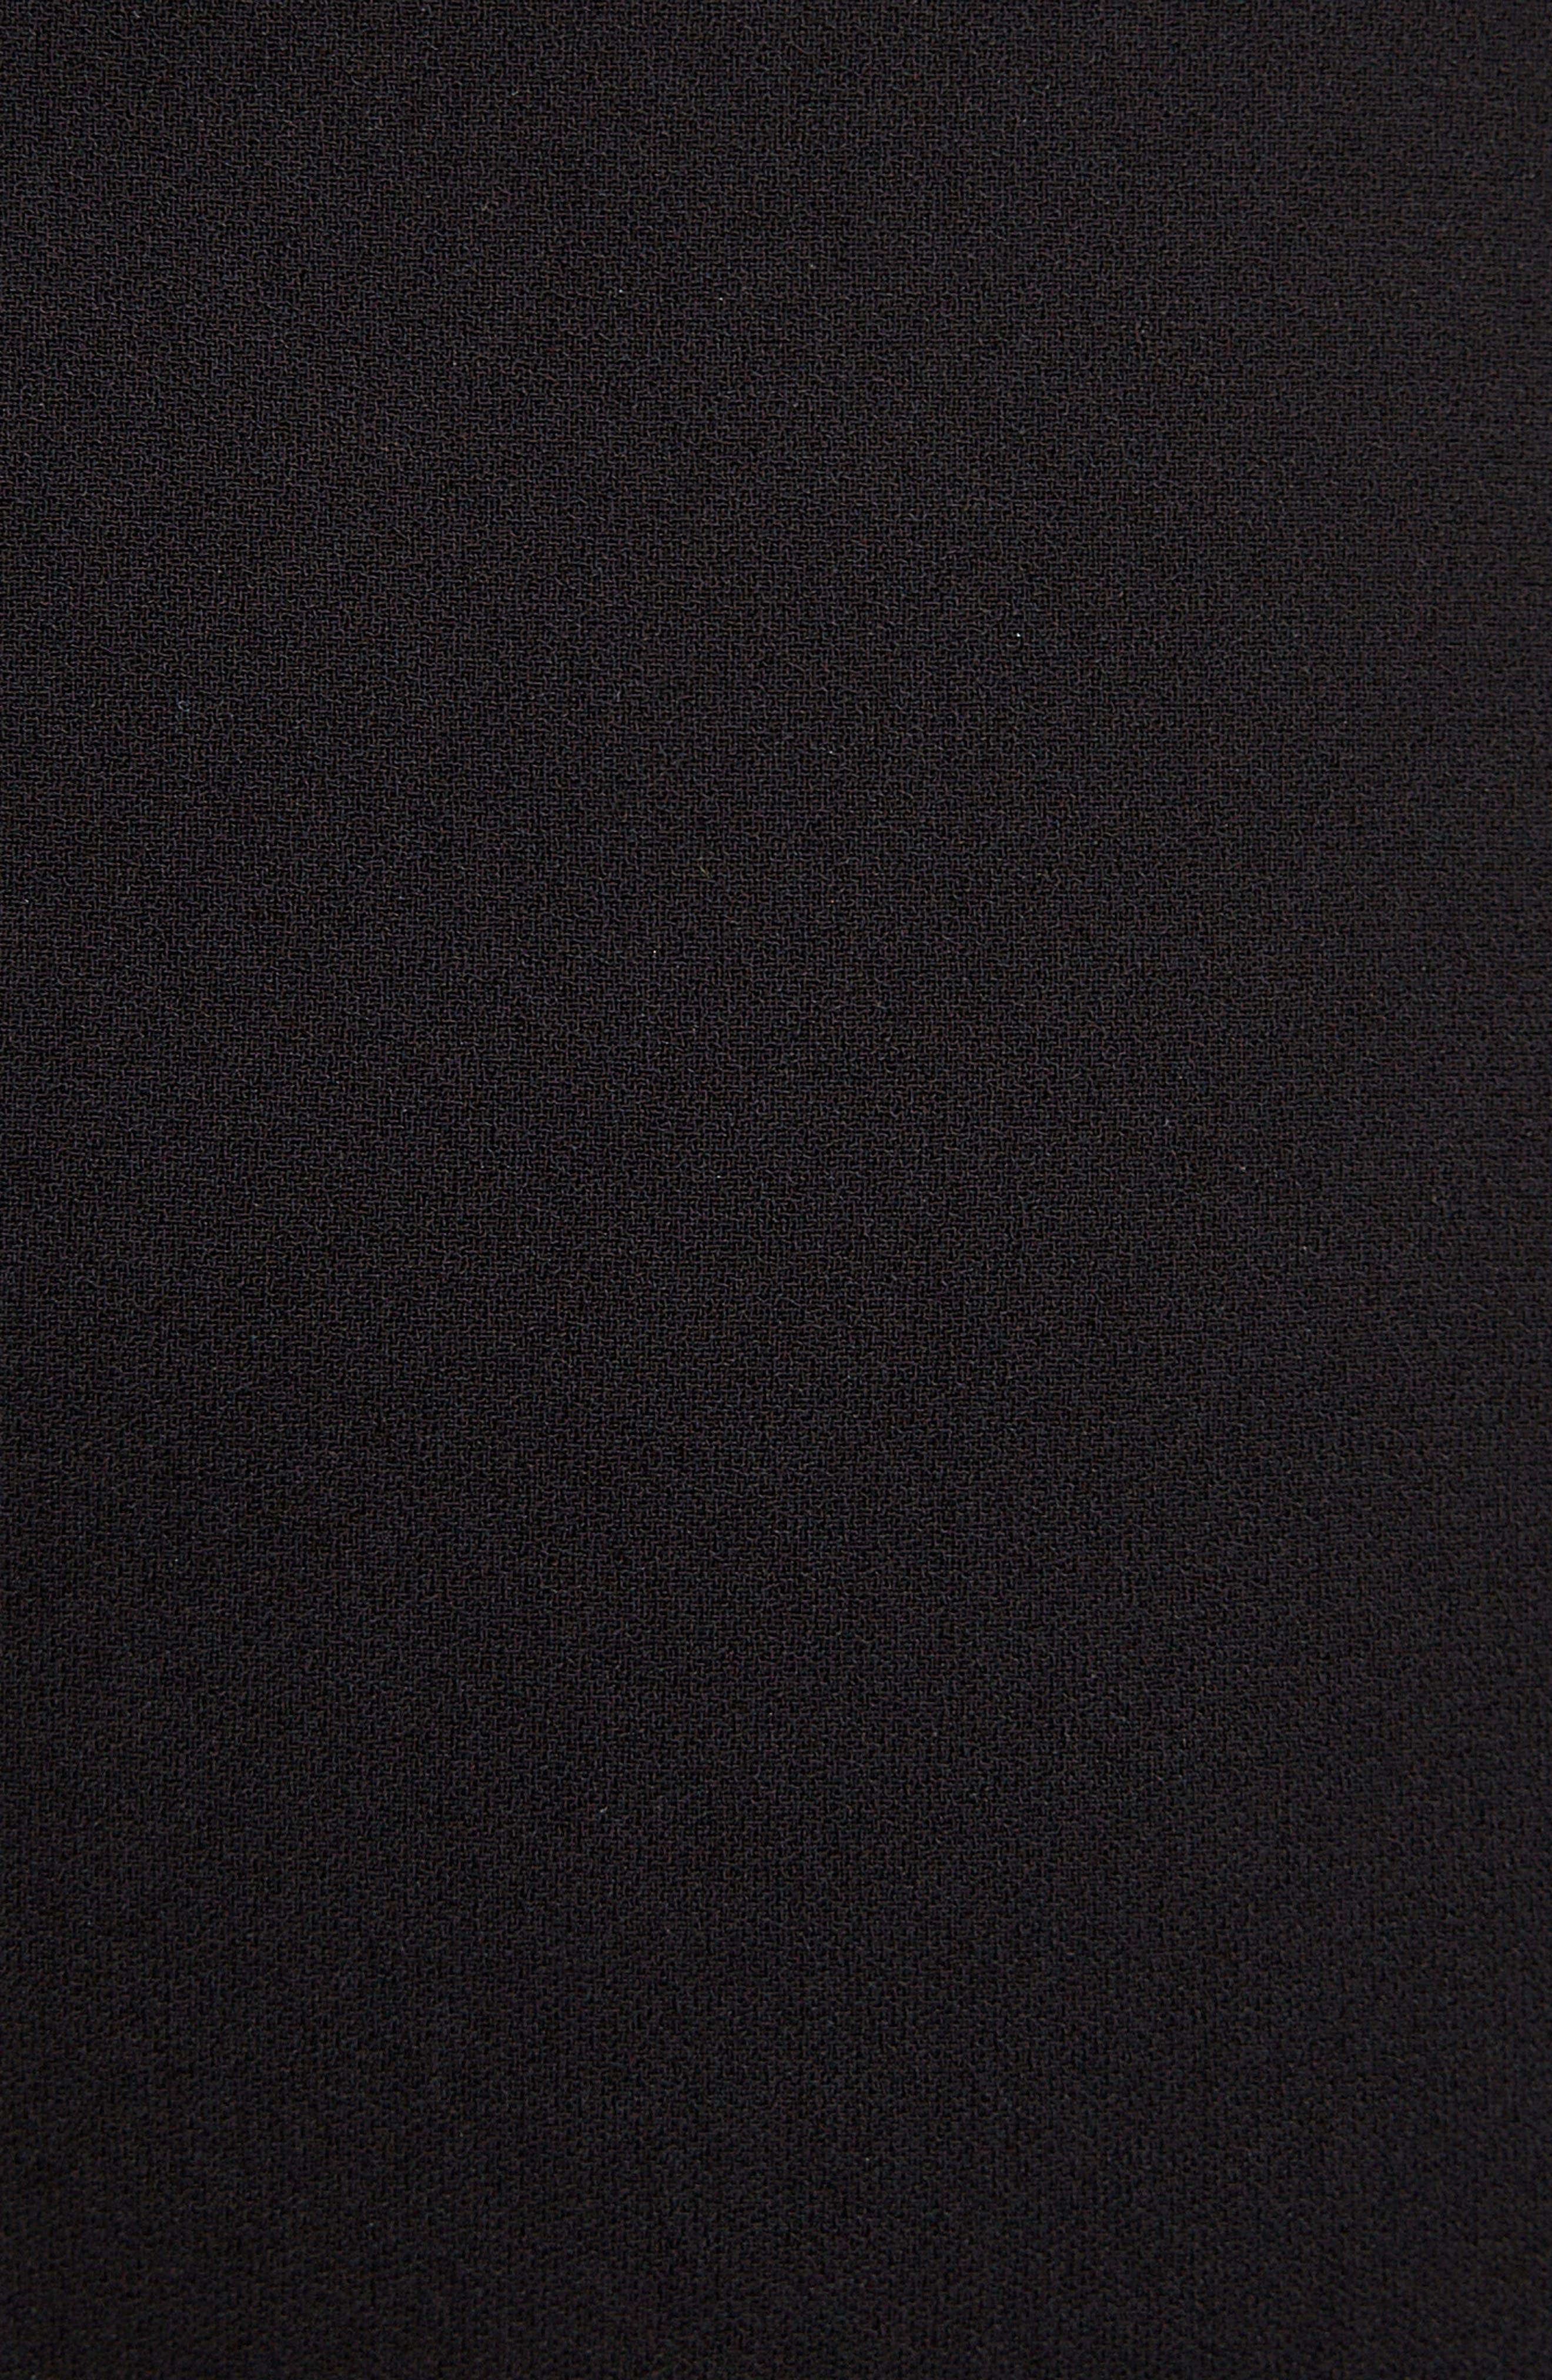 VICTORIA BECKHAM, Back Zip Pencil Skirt, Alternate thumbnail 5, color, BLACK